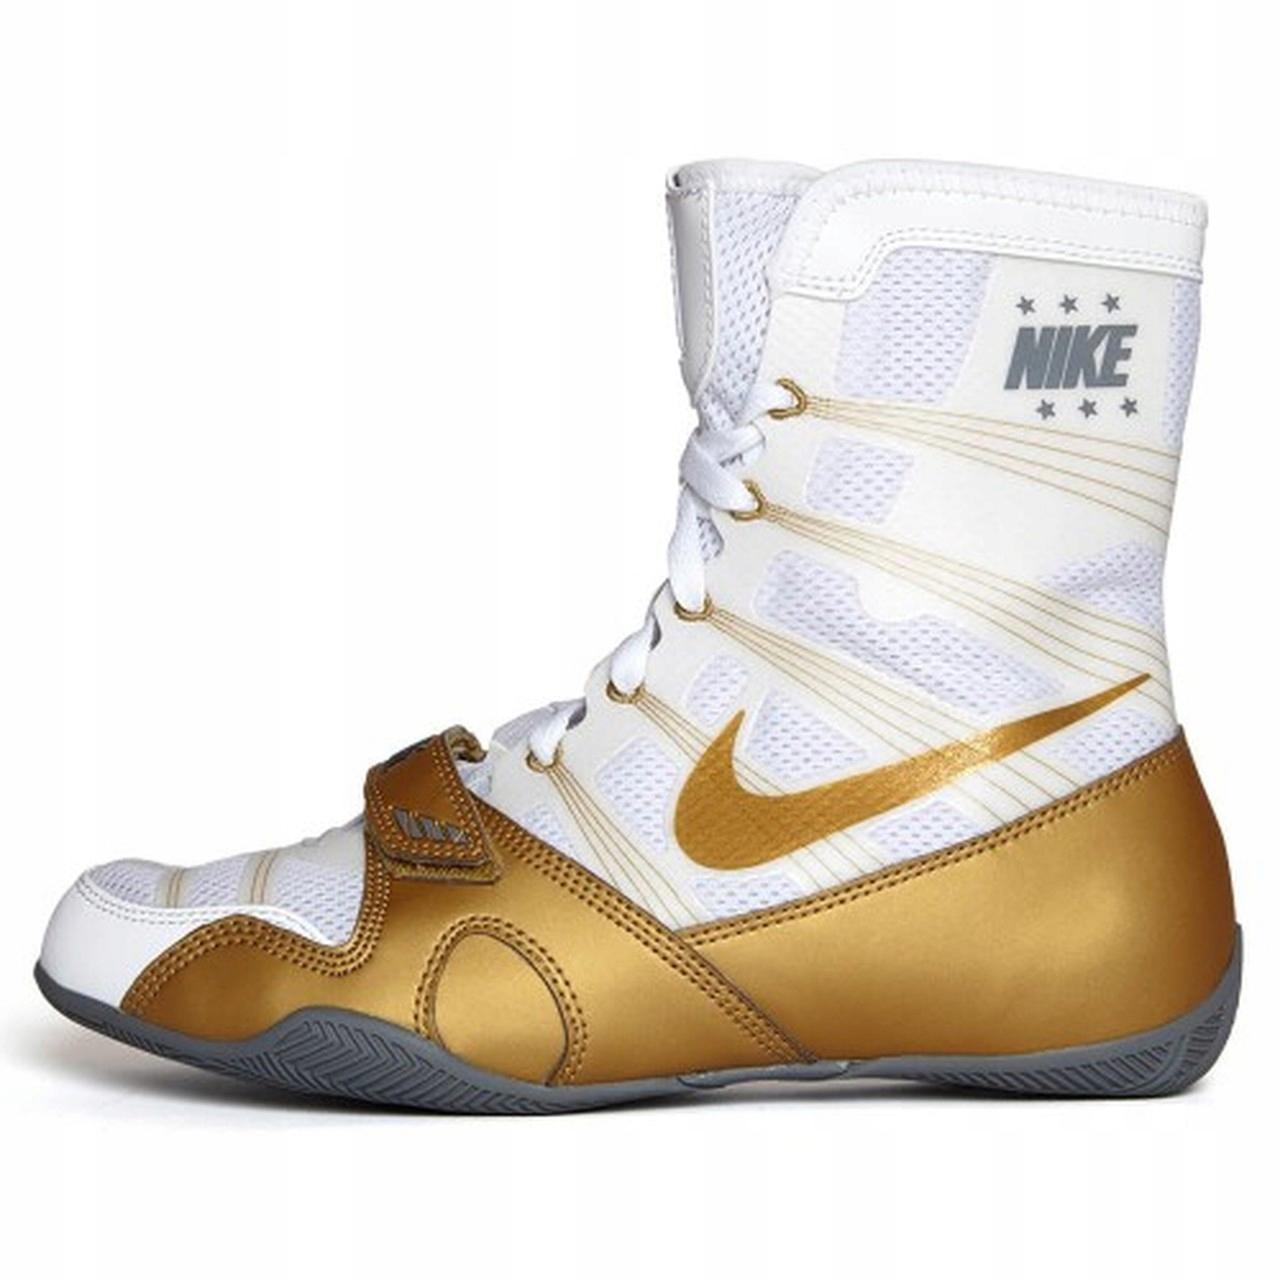 Buty bokserskie BOKS Nike HyperKO LE (107) - 36,5